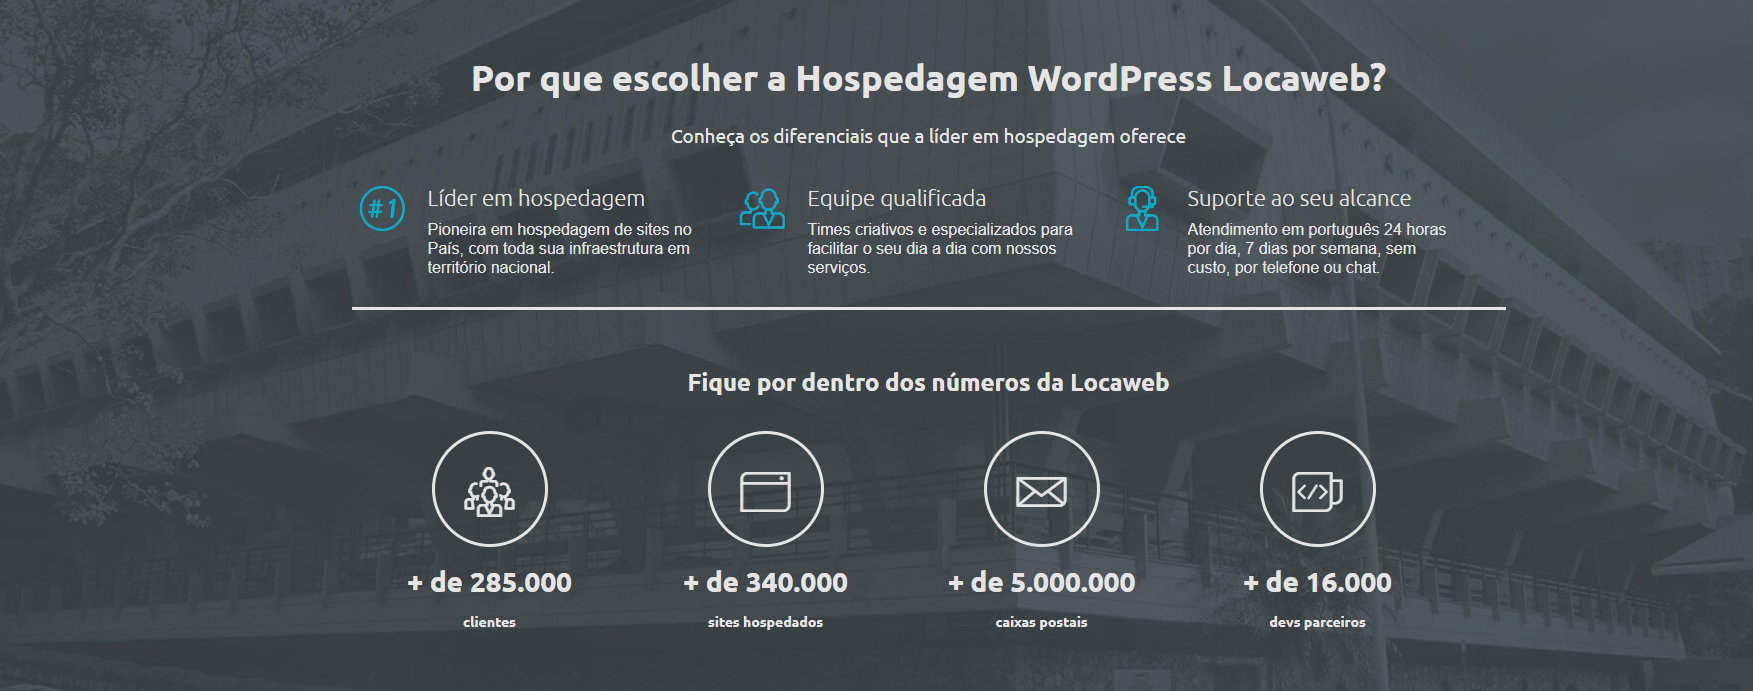 Locaweb Hospedagem WordPress